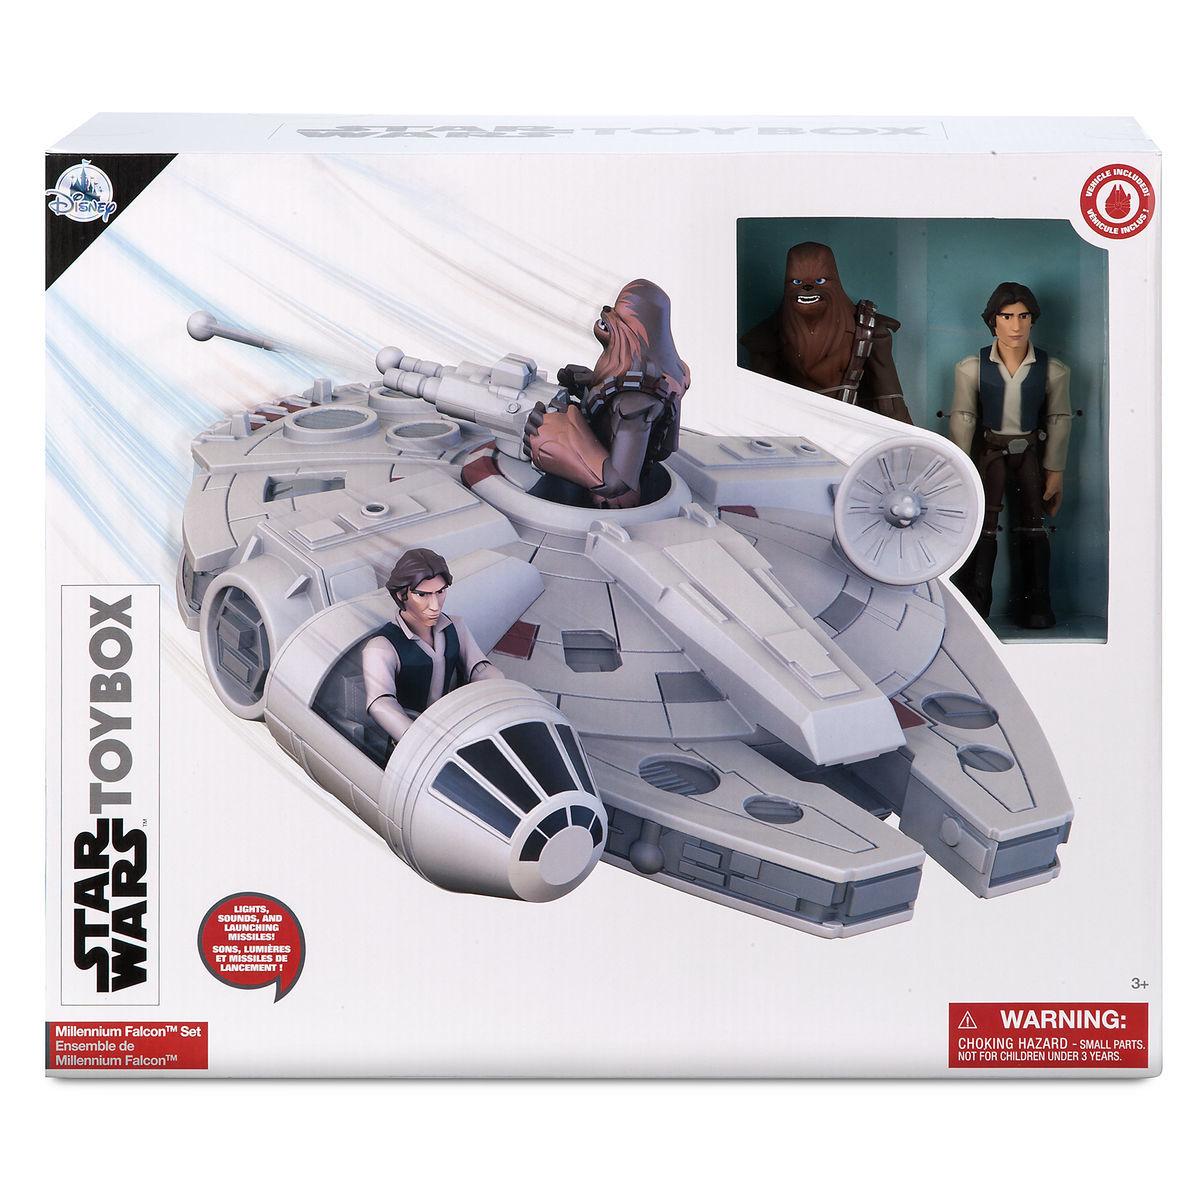 Millennium Falcon Star Wars Play Set